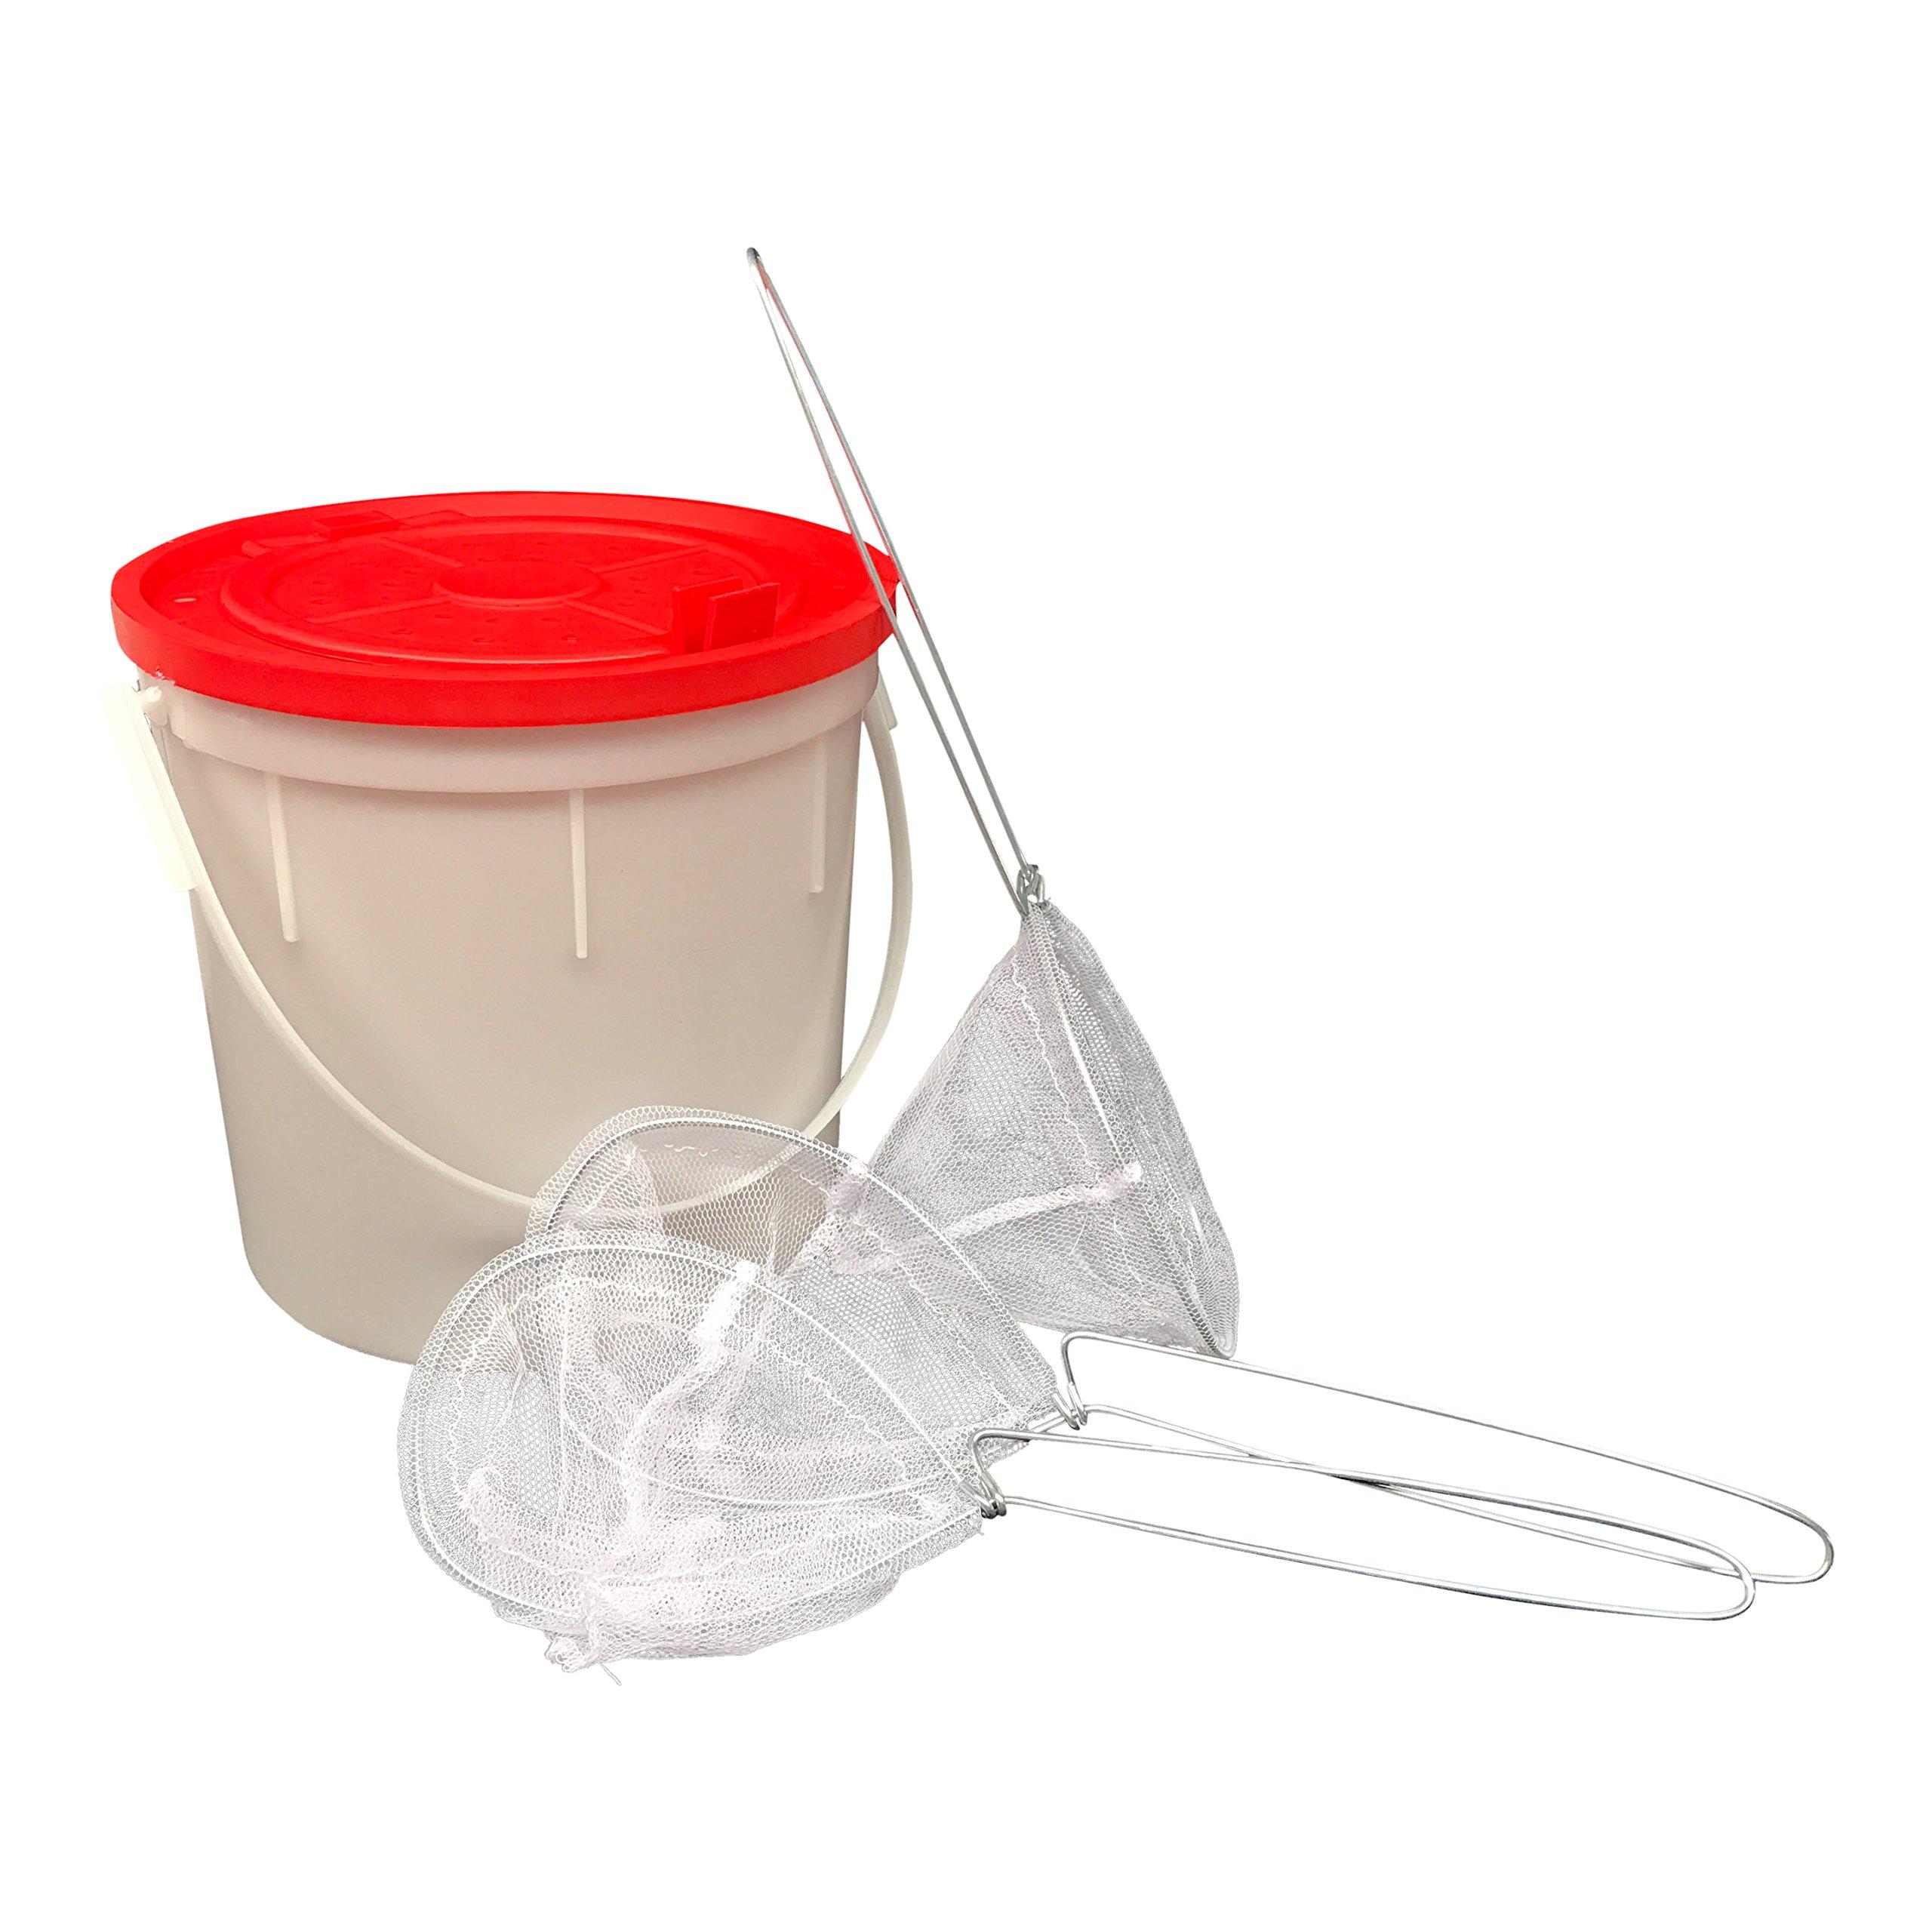 Challenge Plastics Bait Bucket - Fishing Bait Bucket with 3 Minnow Bait Fish Nets